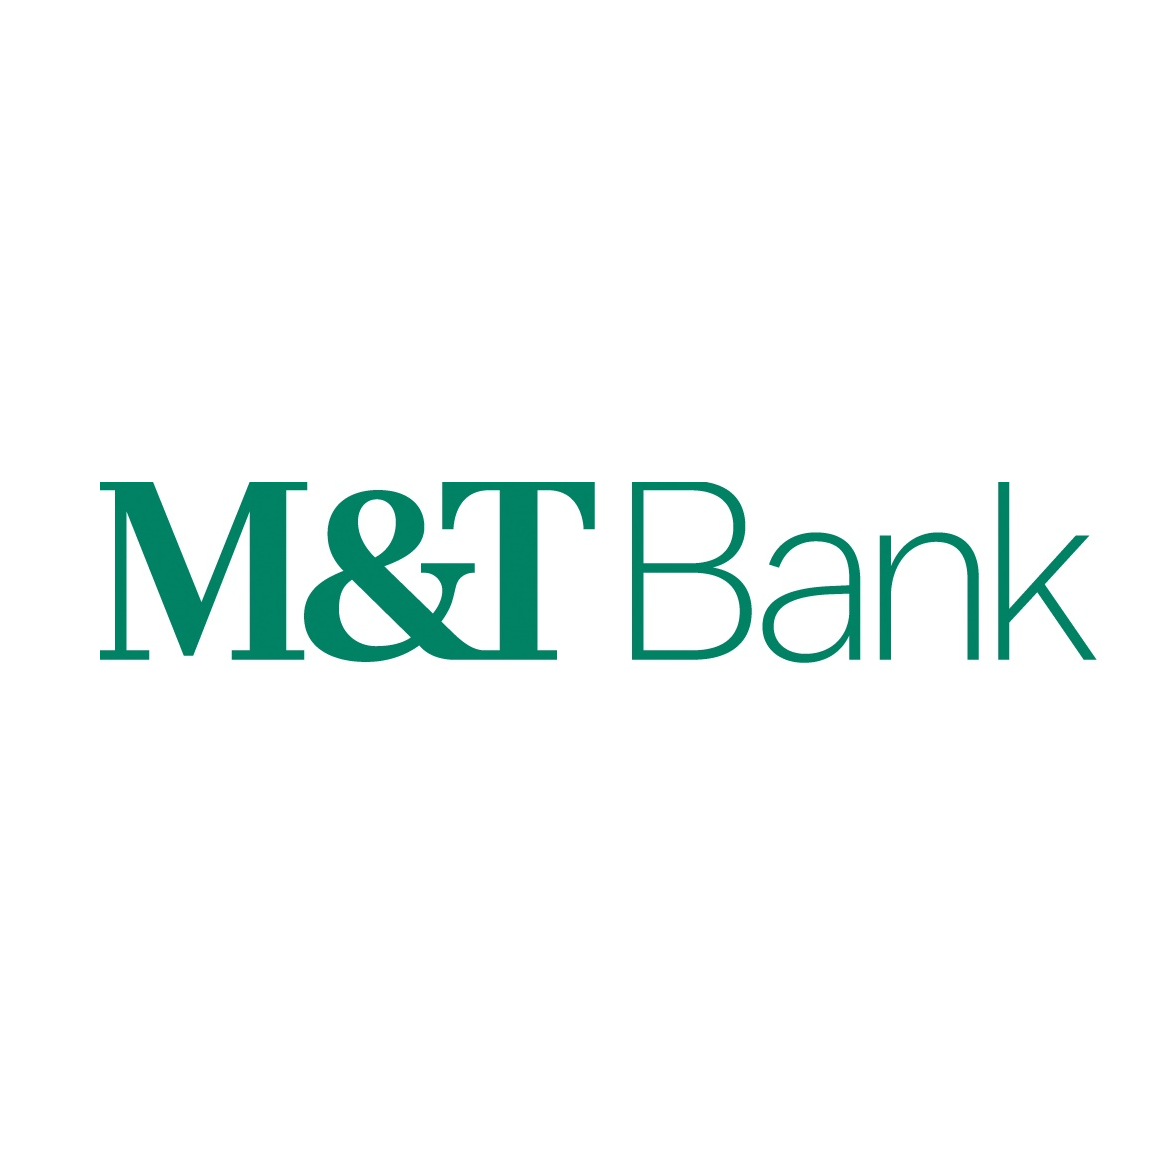 Abbas Merchant, Group VP Marketing Segments and Service at M&T Bank